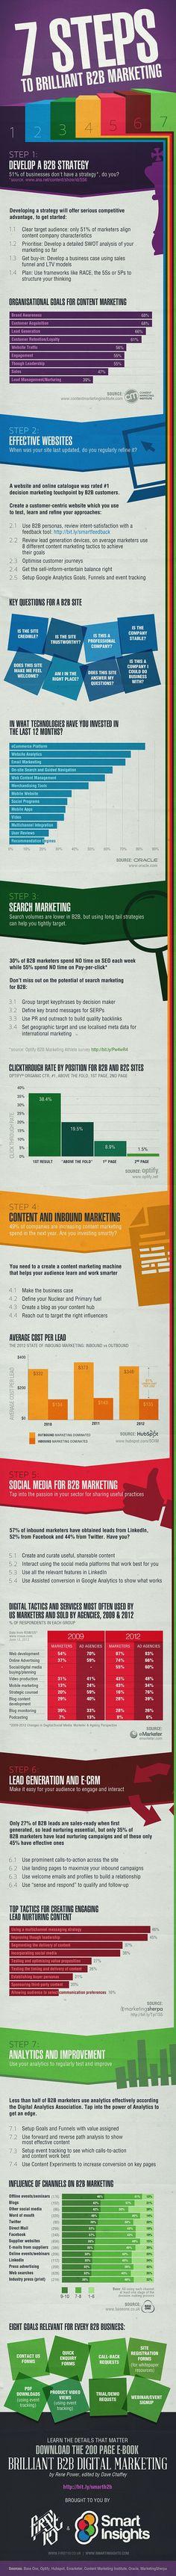 The Ultimate B2B Marketing Strategy Blueprint   BrandonGaille.com